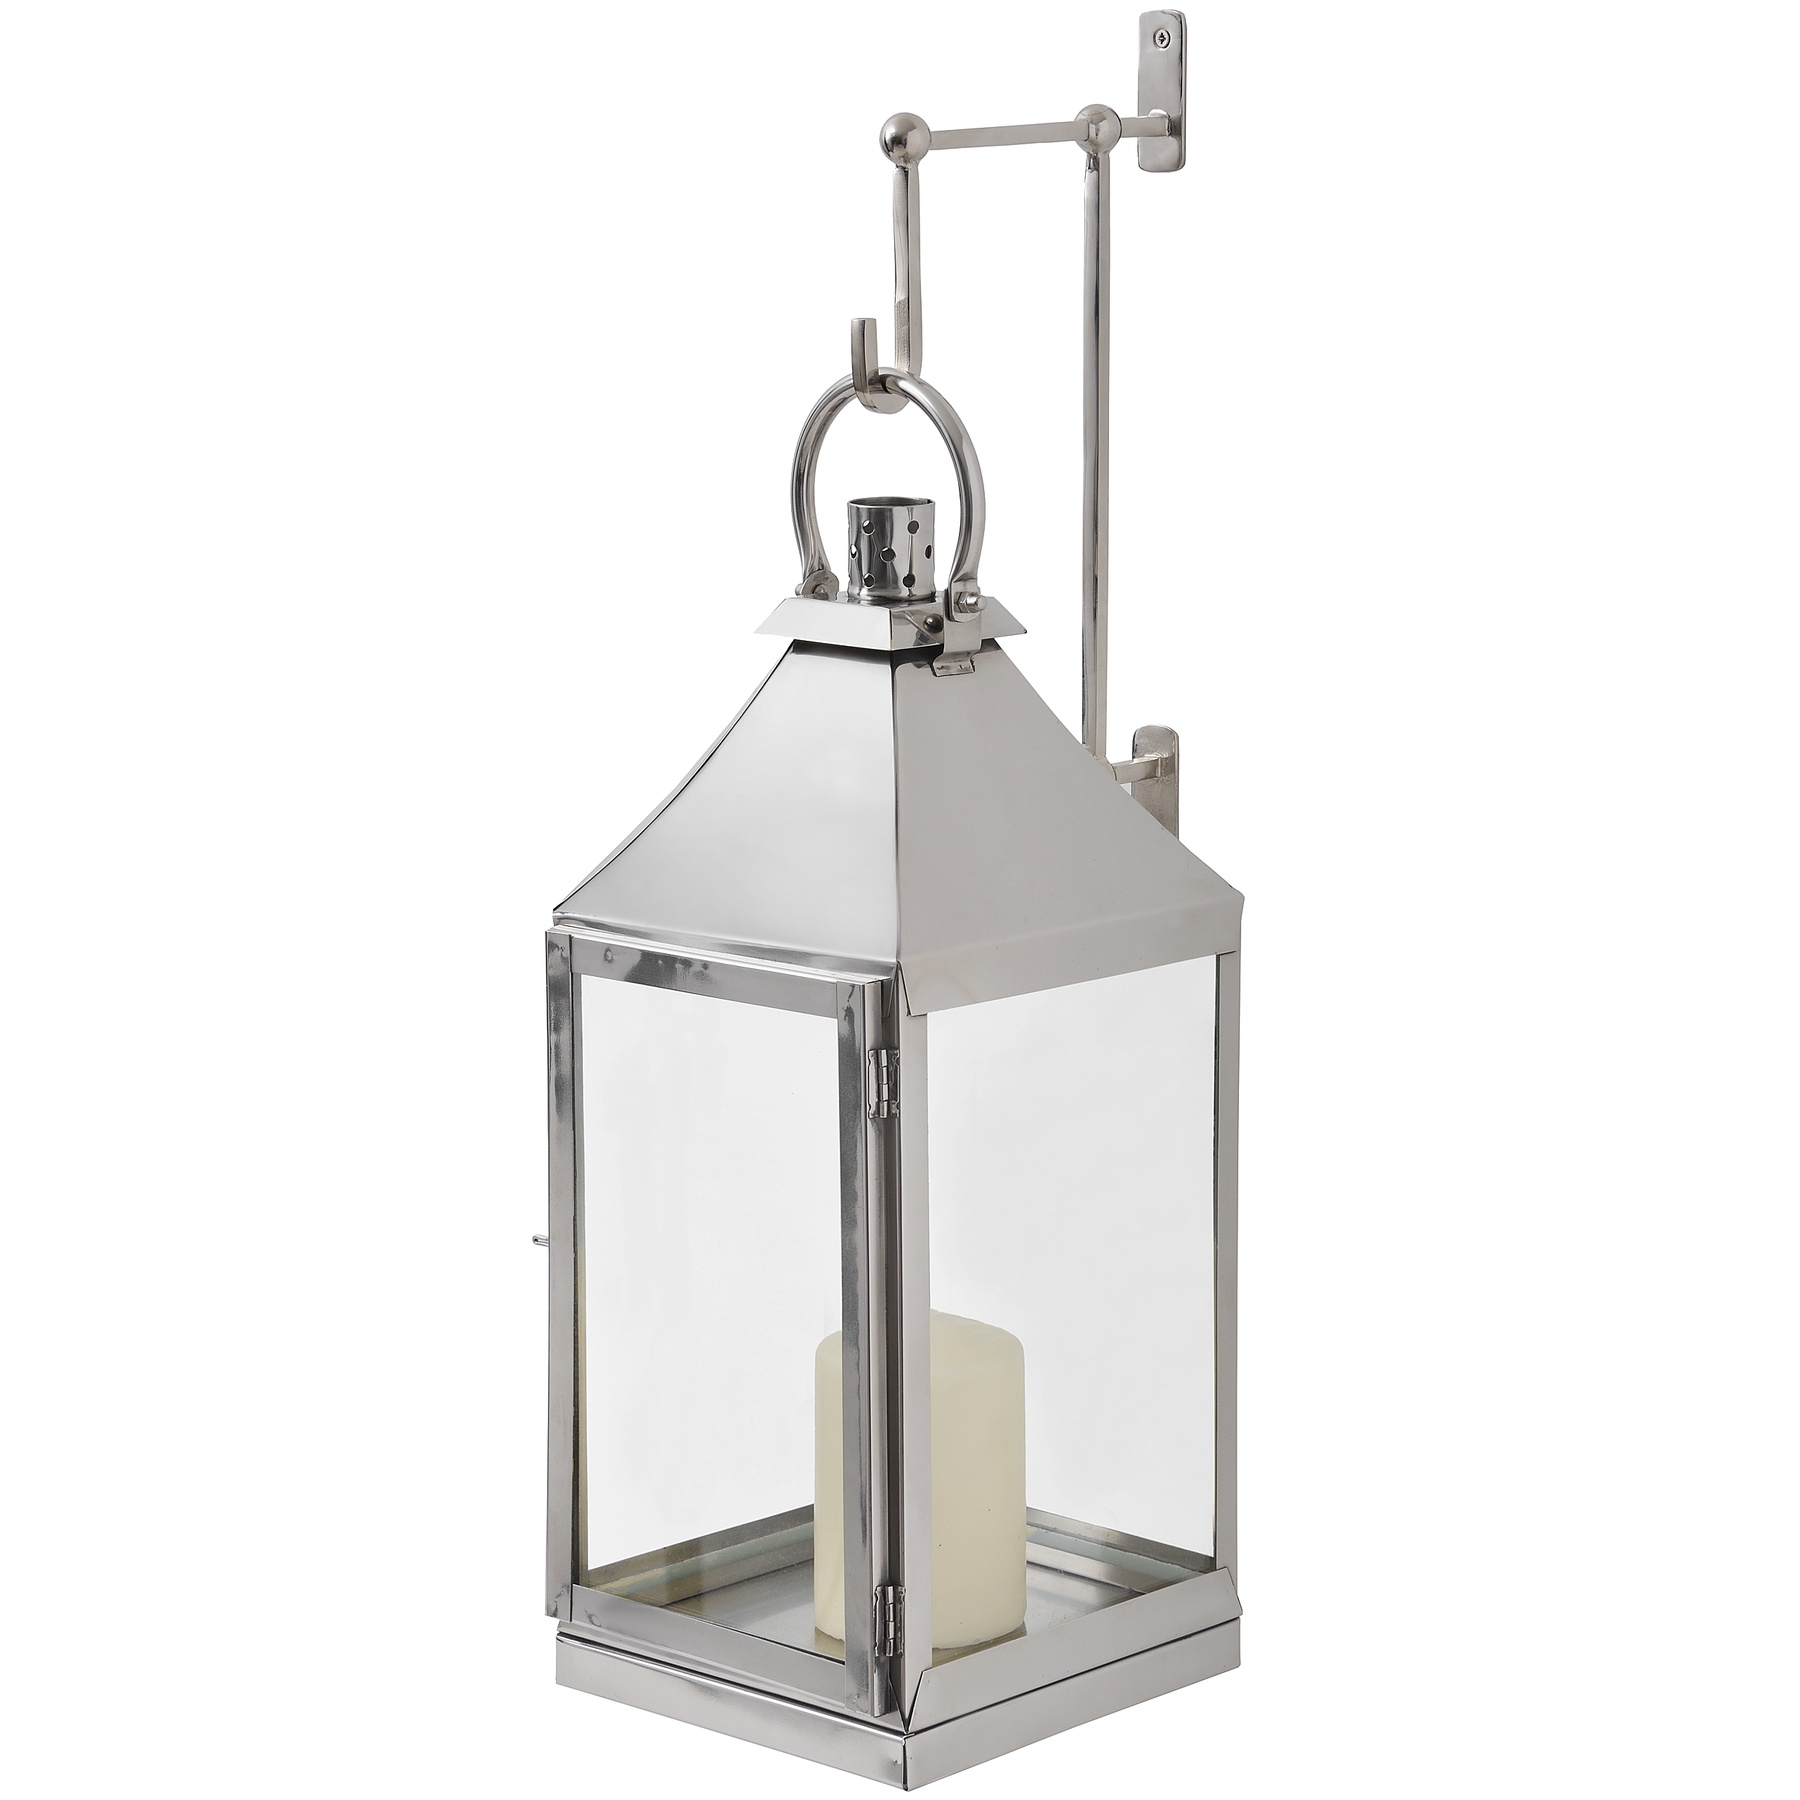 Nickel Lantern With Wall Bracket